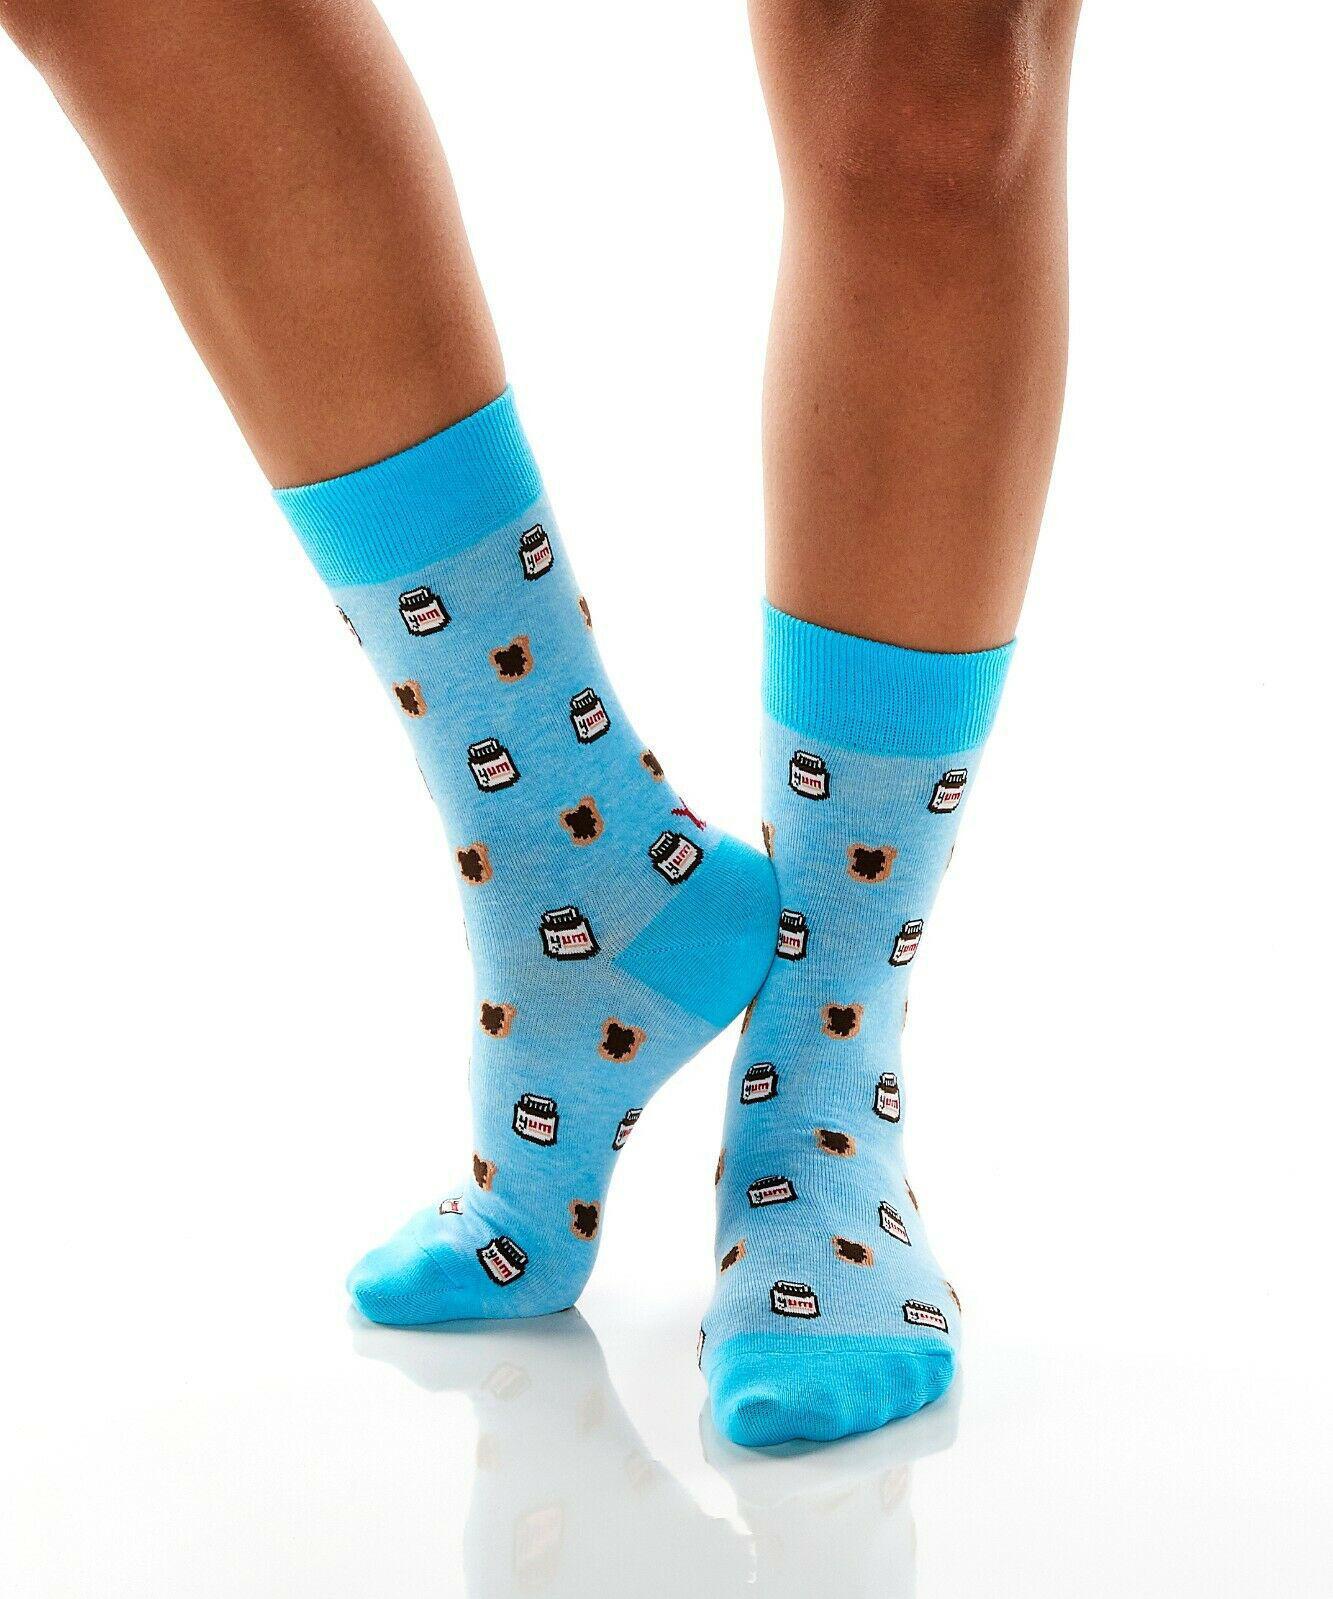 Snack of Champions Women's Crew Socks by Yo Sox